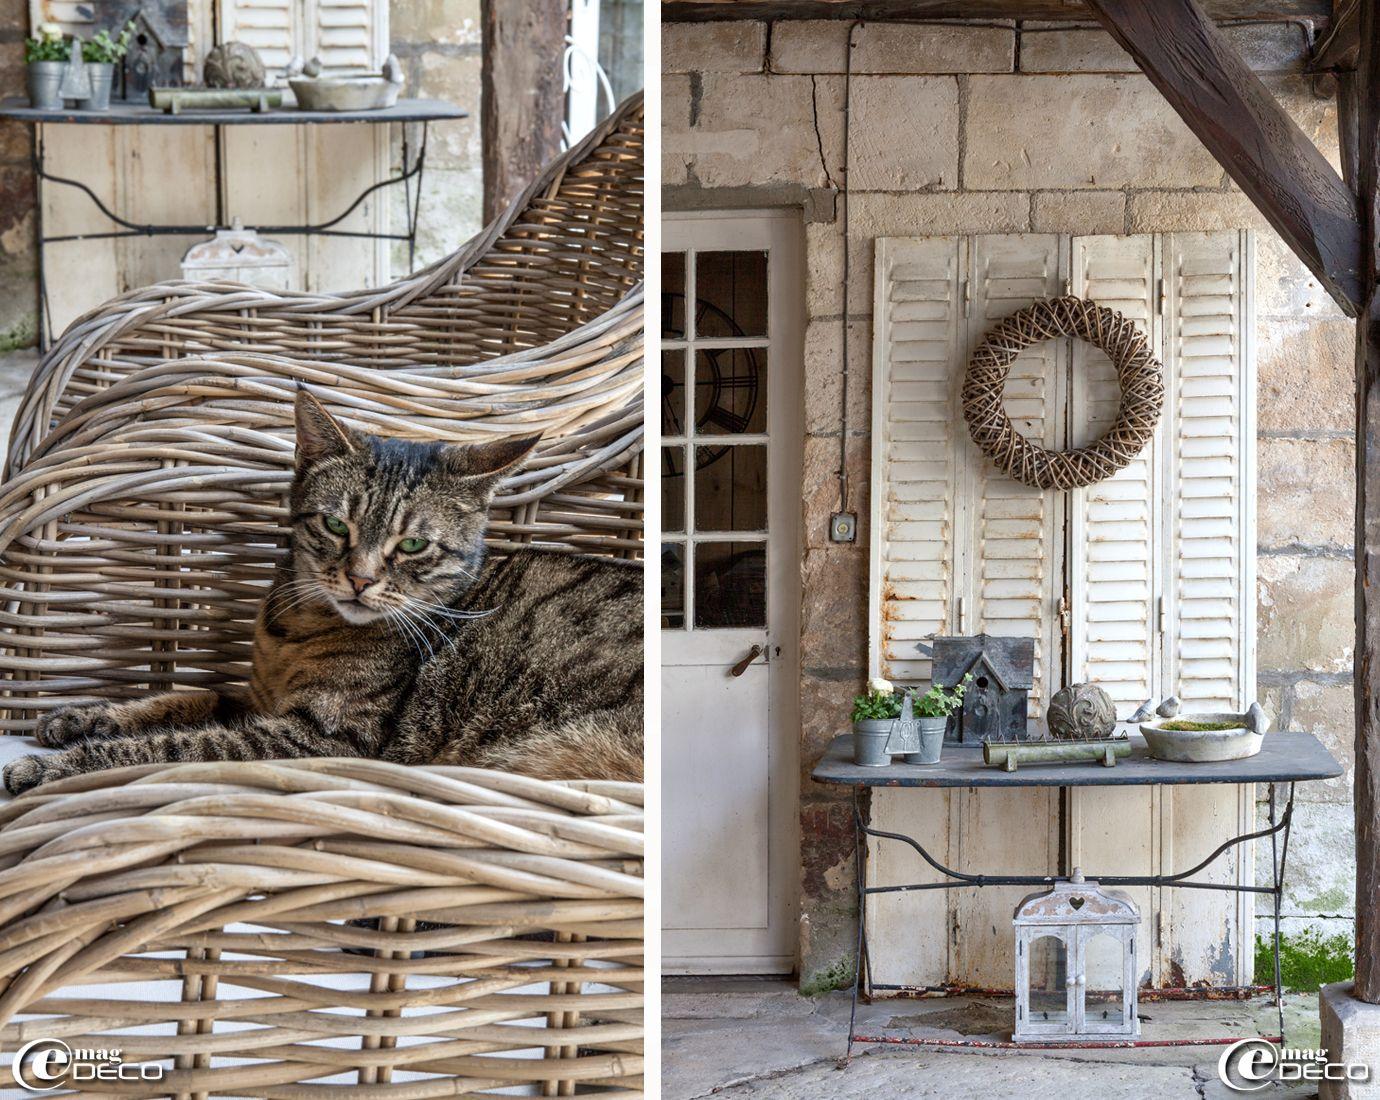 Une maison de famille en picardie e magdeco magazine de décoration deco pinterest french interior shabby and french country style